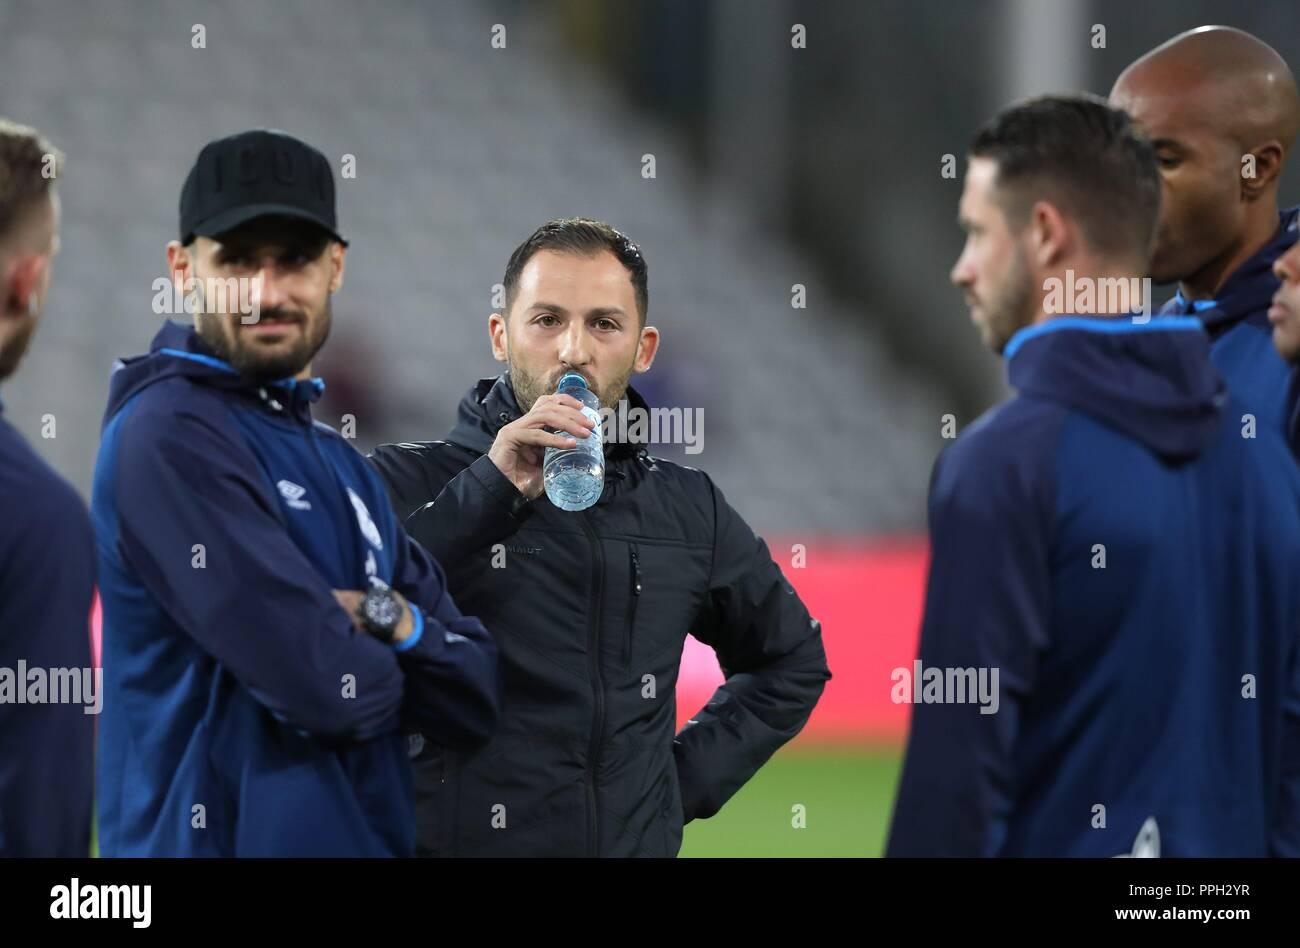 firo: 25.09.2018 Football, Football: 1. Bundesliga, Season 2018/2019 SC Freiburg - S04 FC Schalke 04 S04 coach, Domenico Tedesco,   usage worldwide - Stock Image